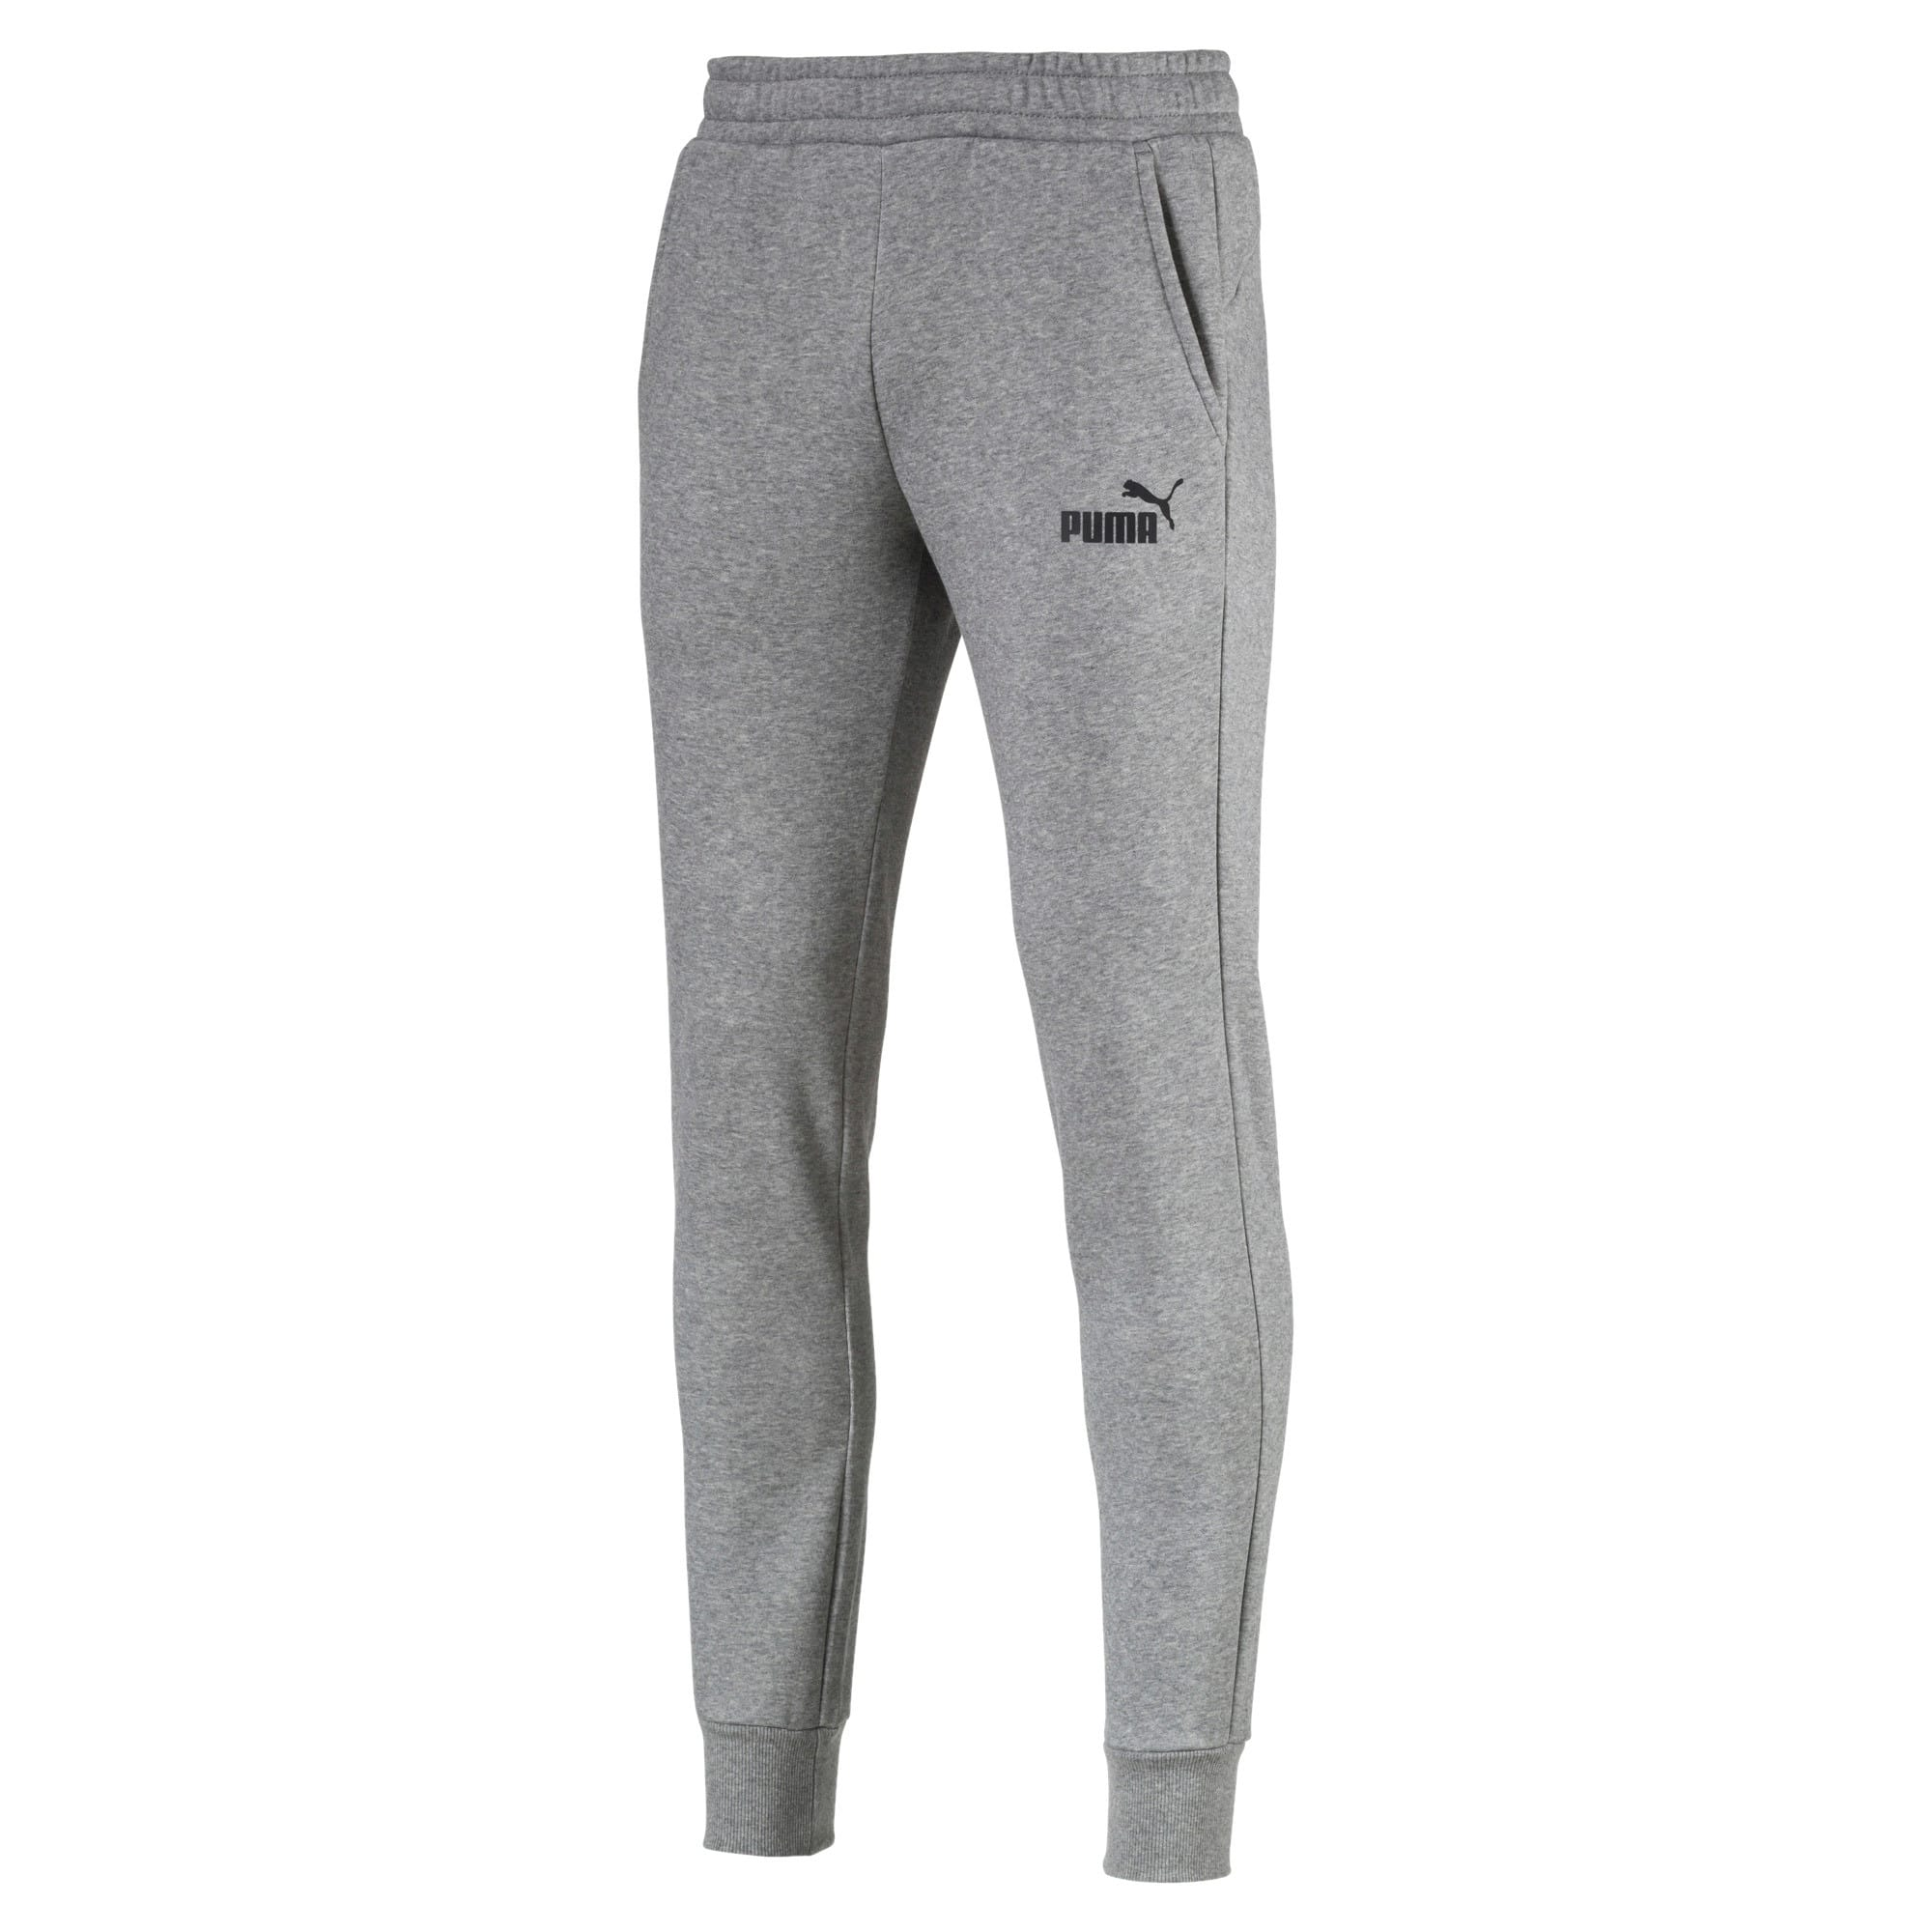 Thumbnail 2 of Essentials Men's Fleece Knit Pants, Medium Gray Heather, medium